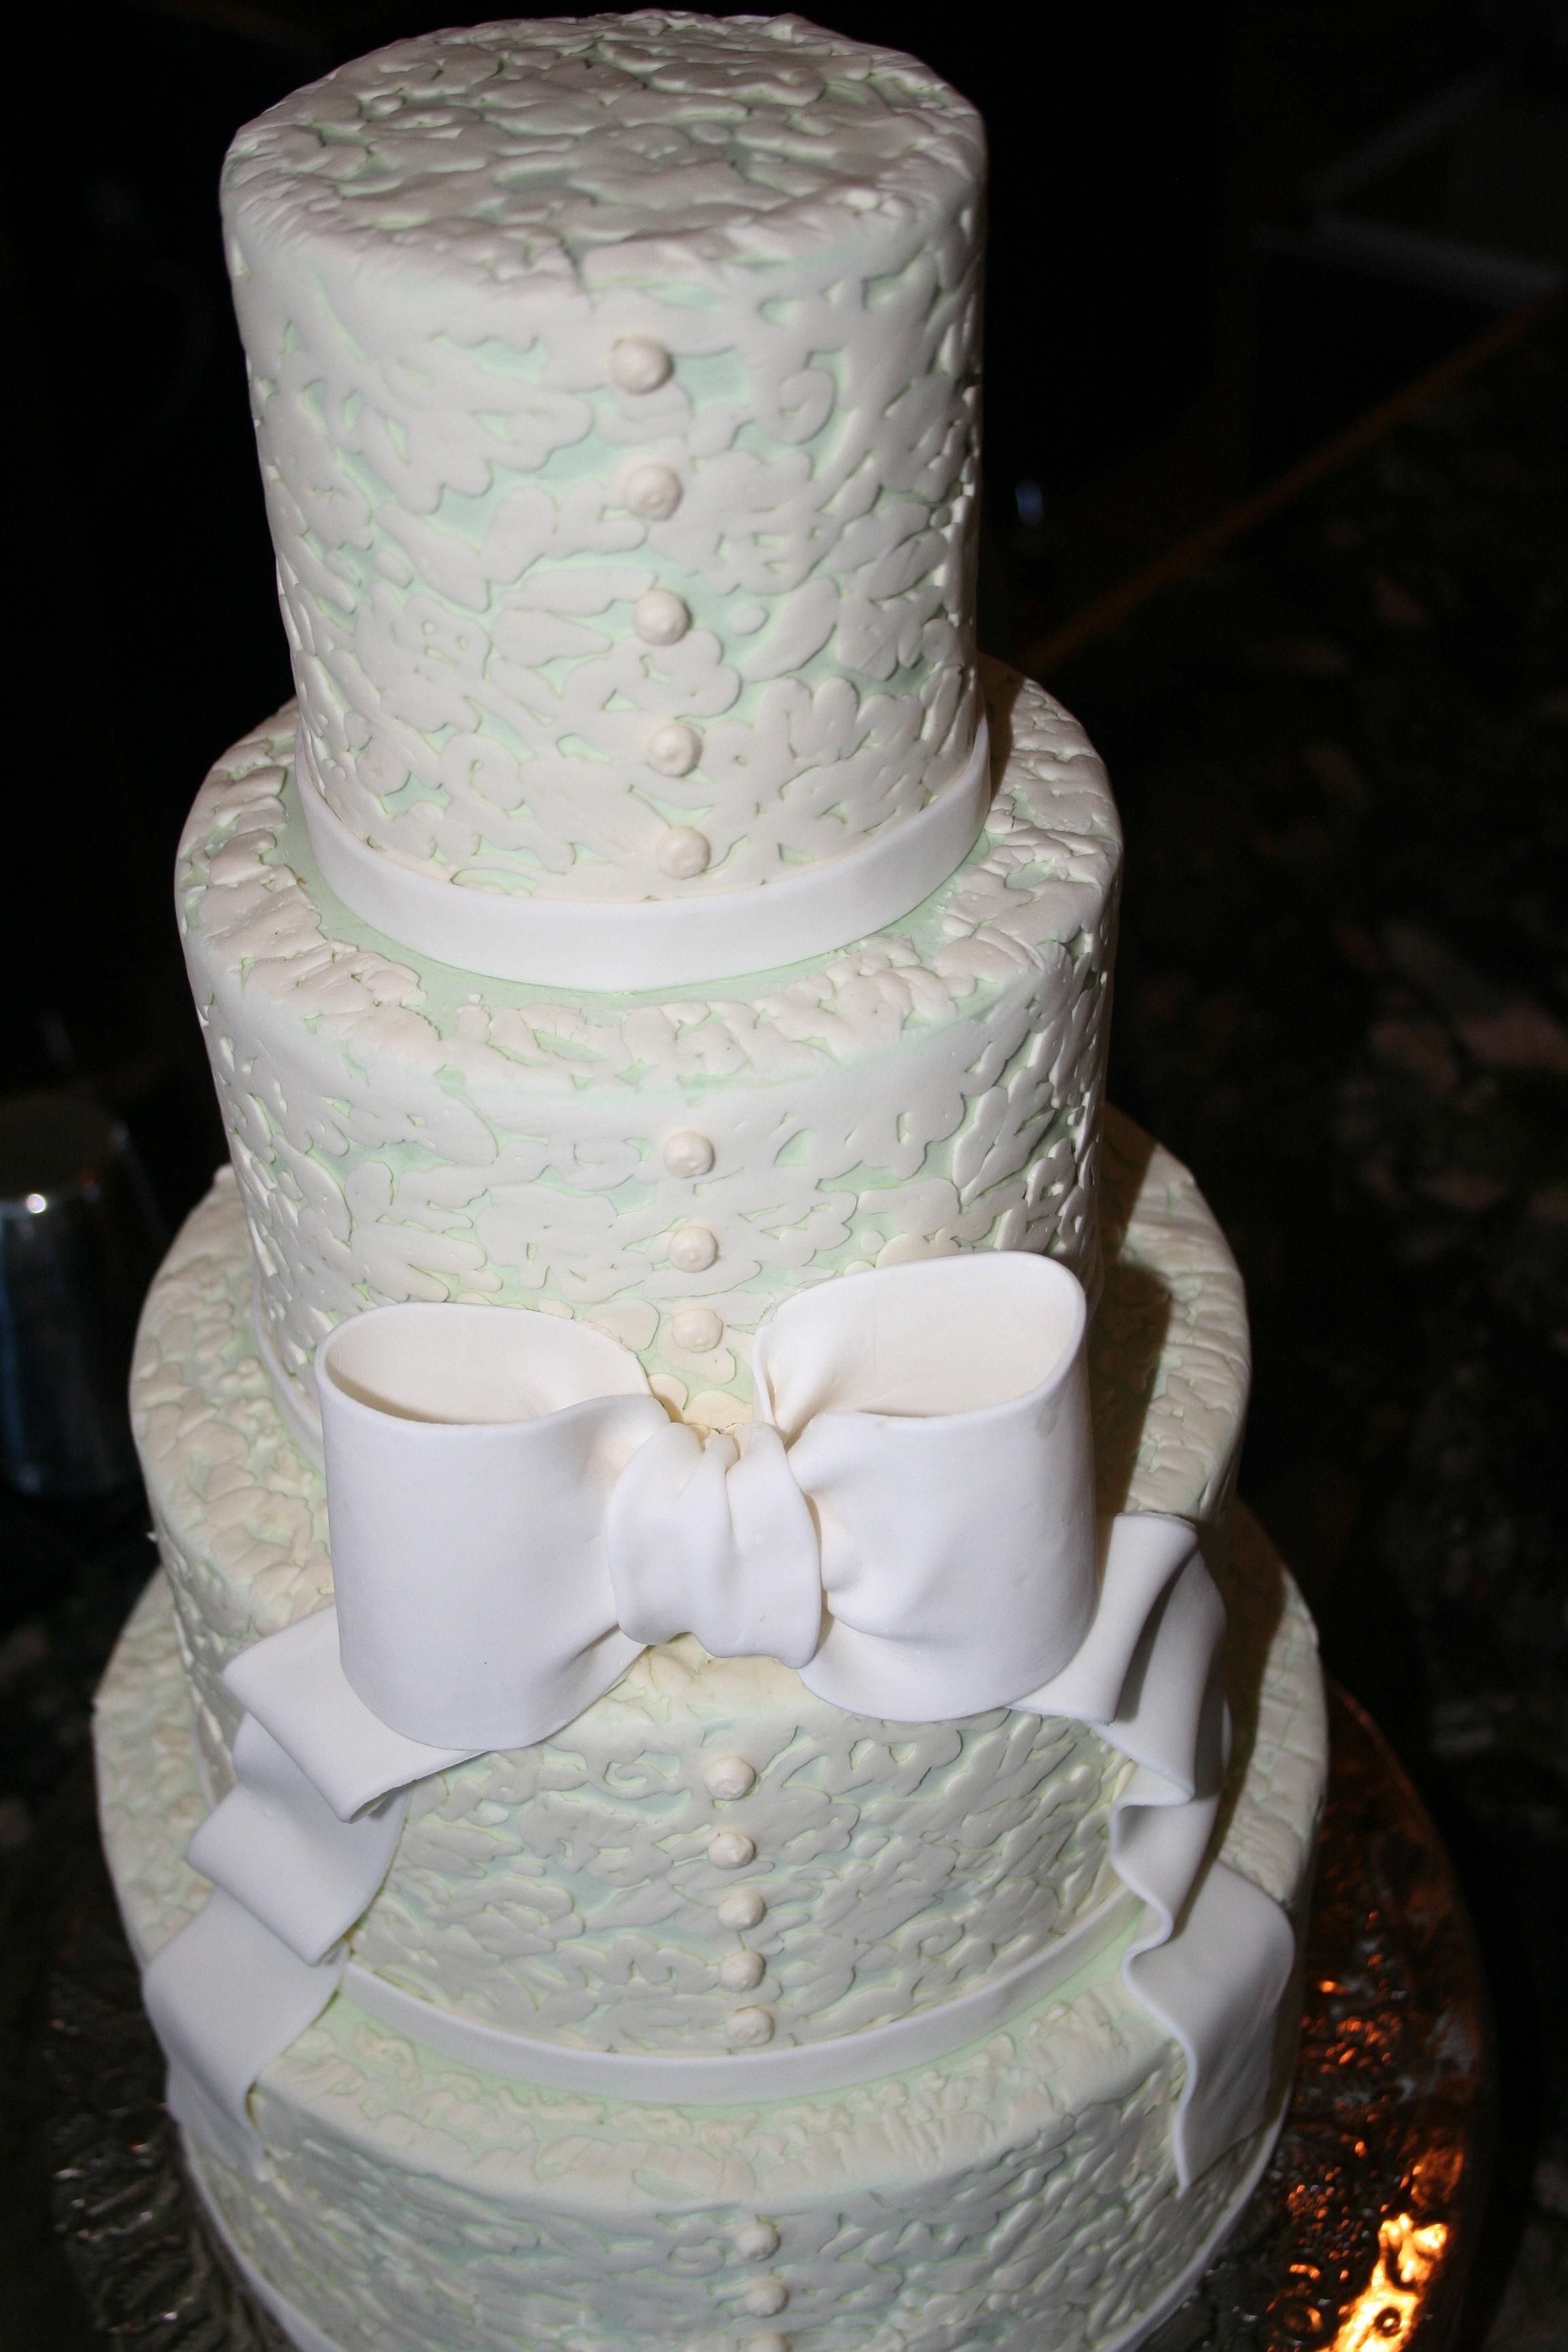 Hallmark Cakes NC mountain wedding cakes Boone NC wedding